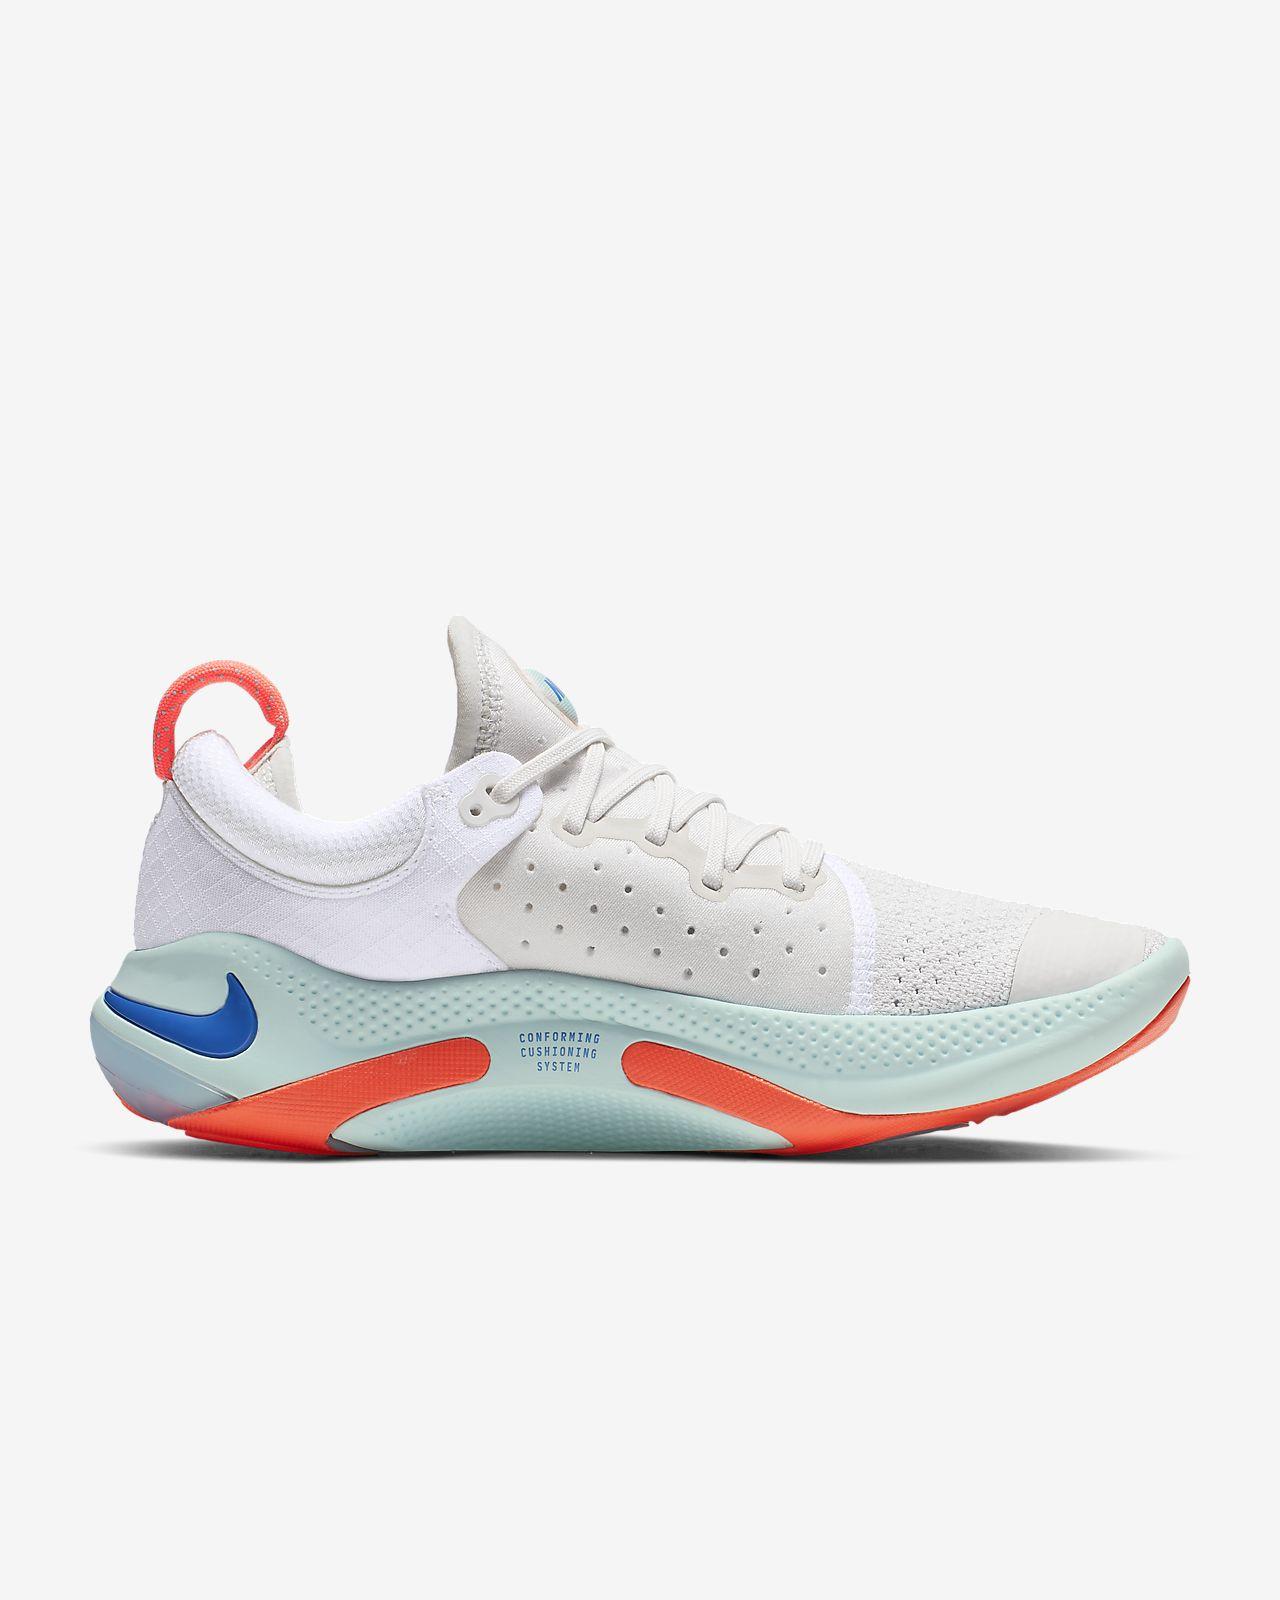 Acquista Nike Joyride Run Flyknit FK 2019 Platinum Tint